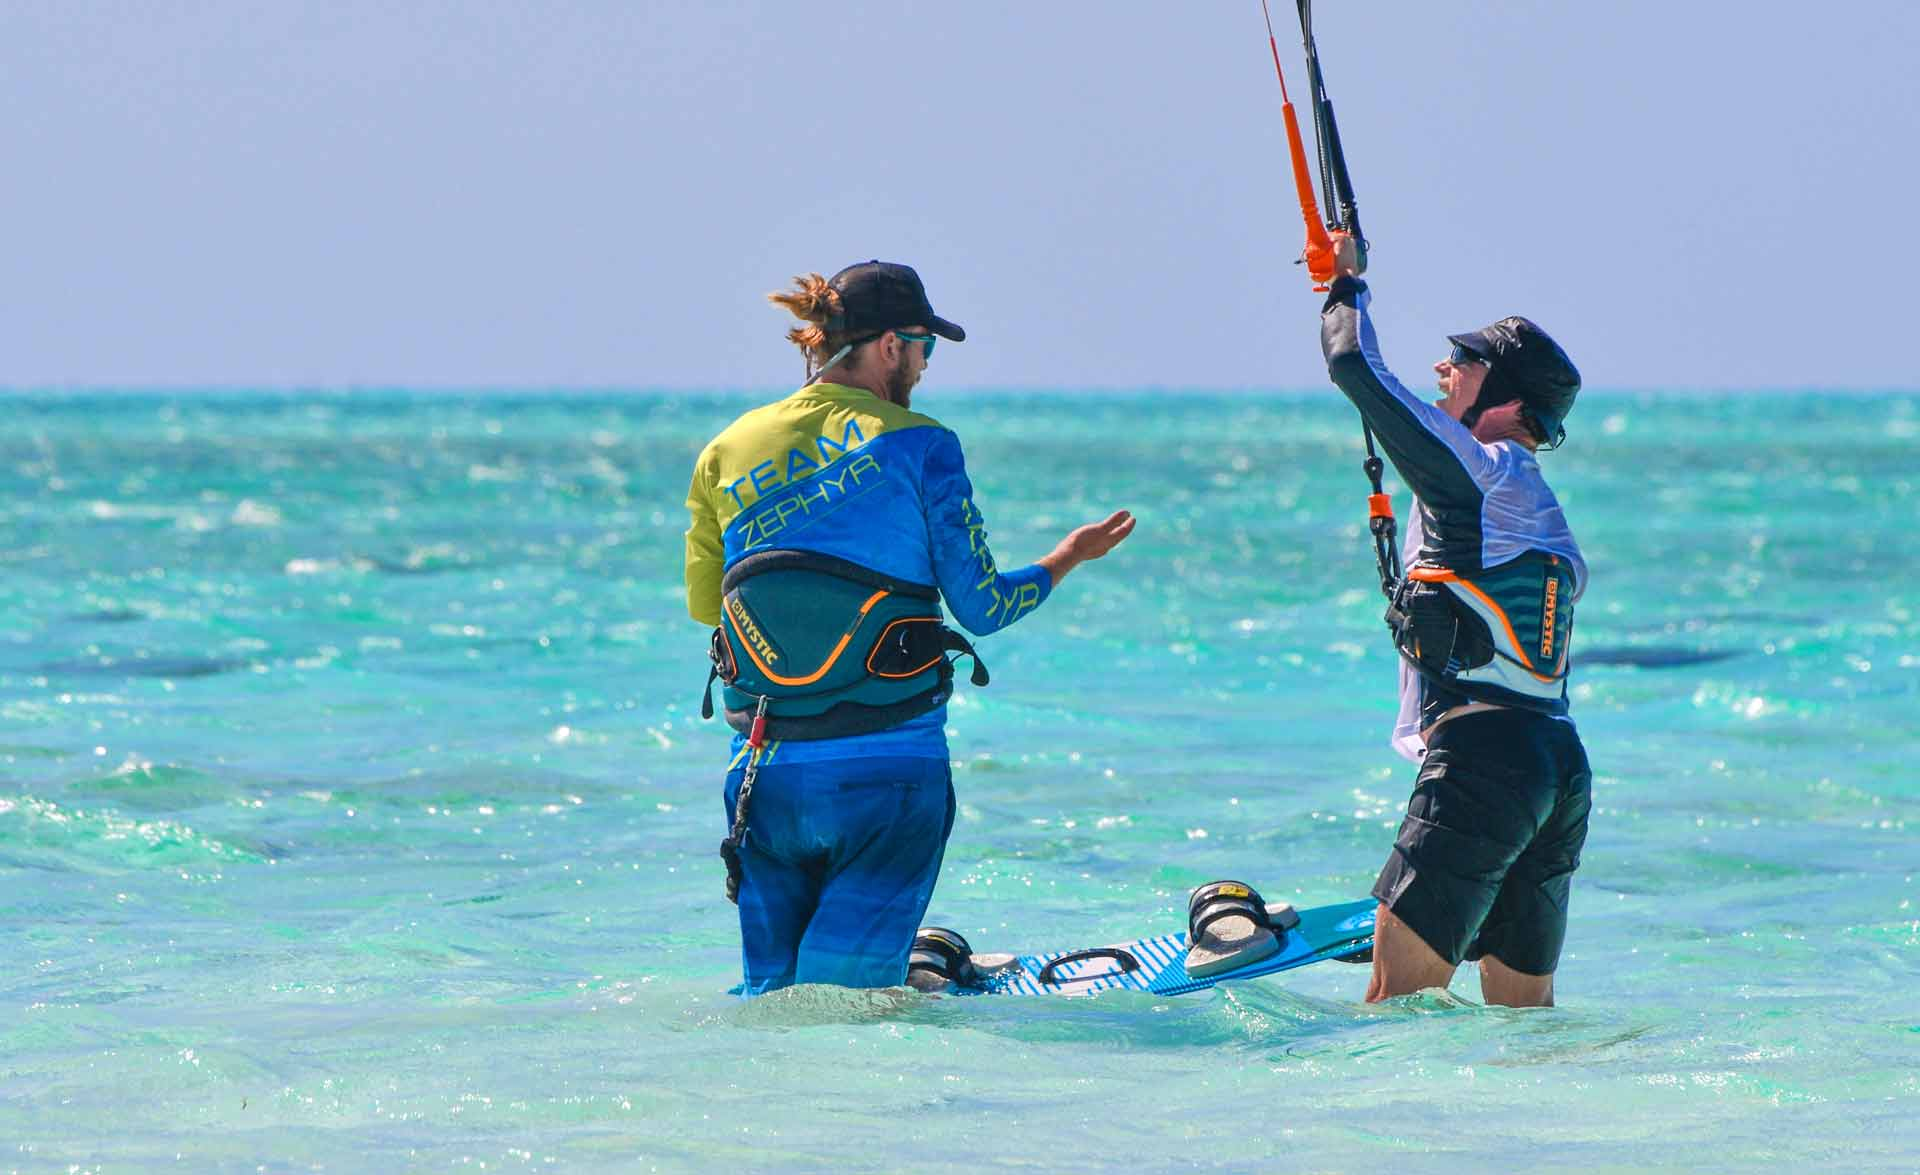 kitesurfing-lessons-sunshine-coast-ocean-addicts-kite-lessons-maroochydore